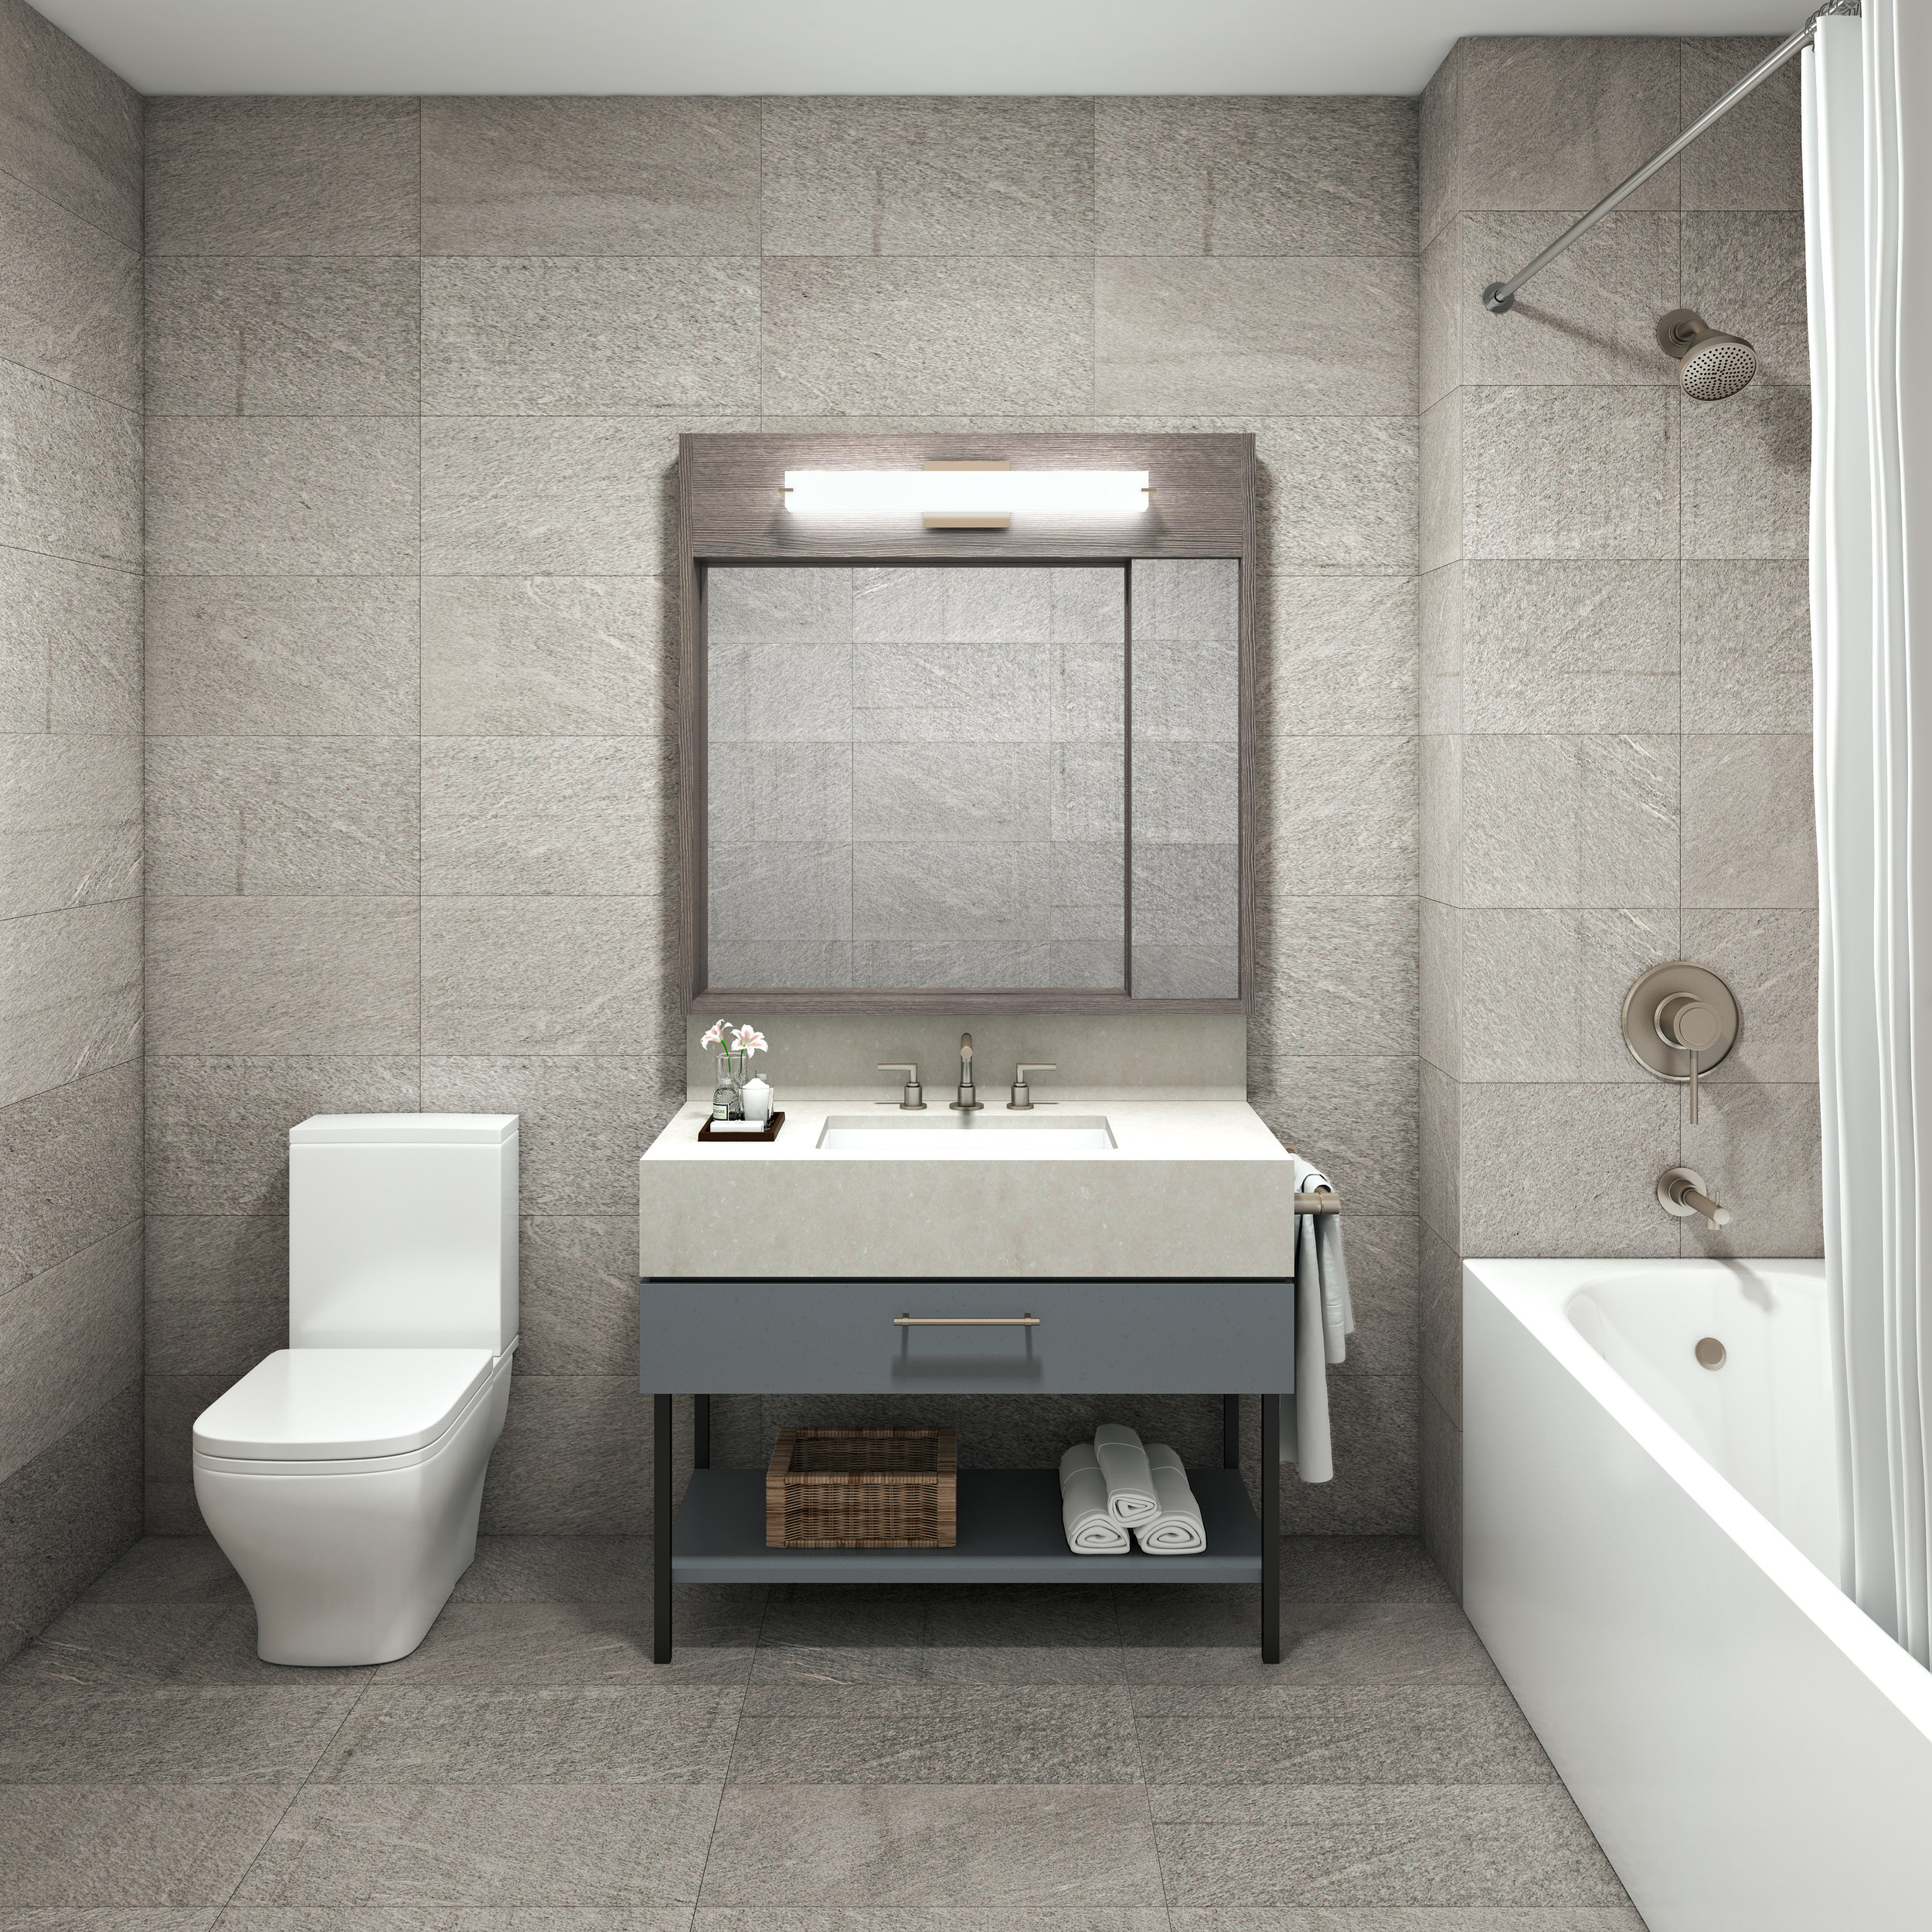 South Capitol_Bathroom.jpg